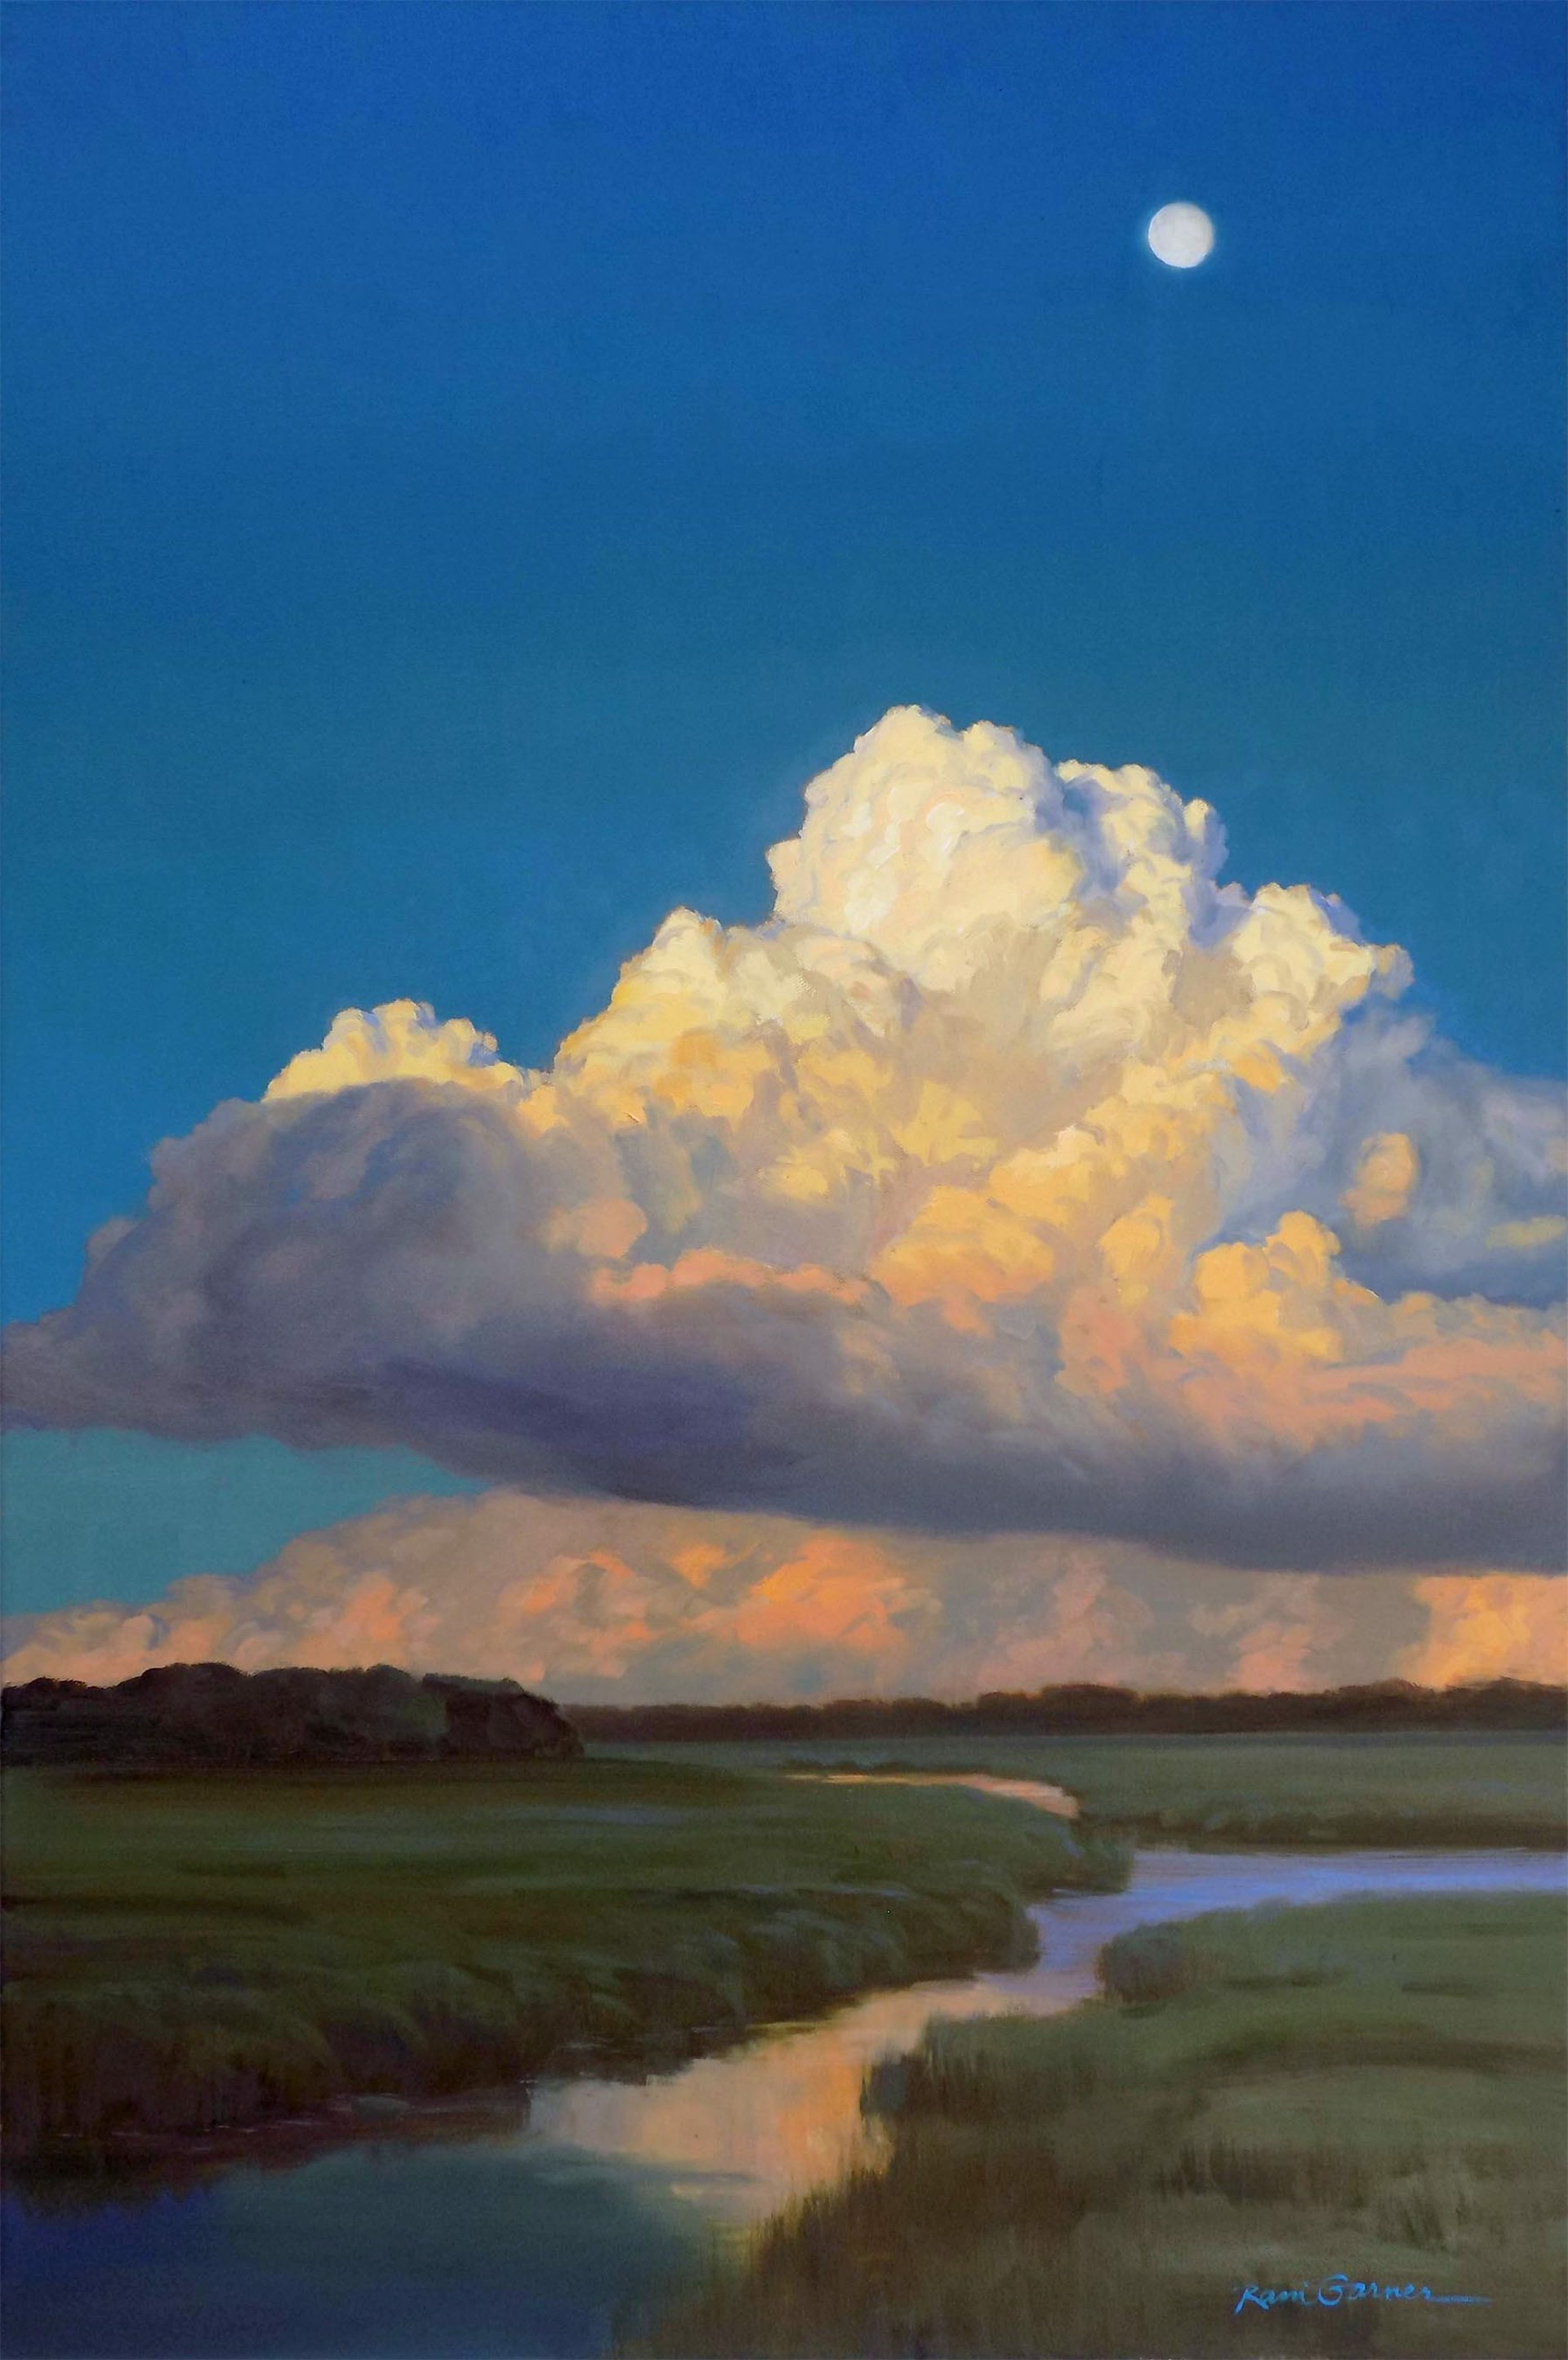 On the Horizon by Rani Garner